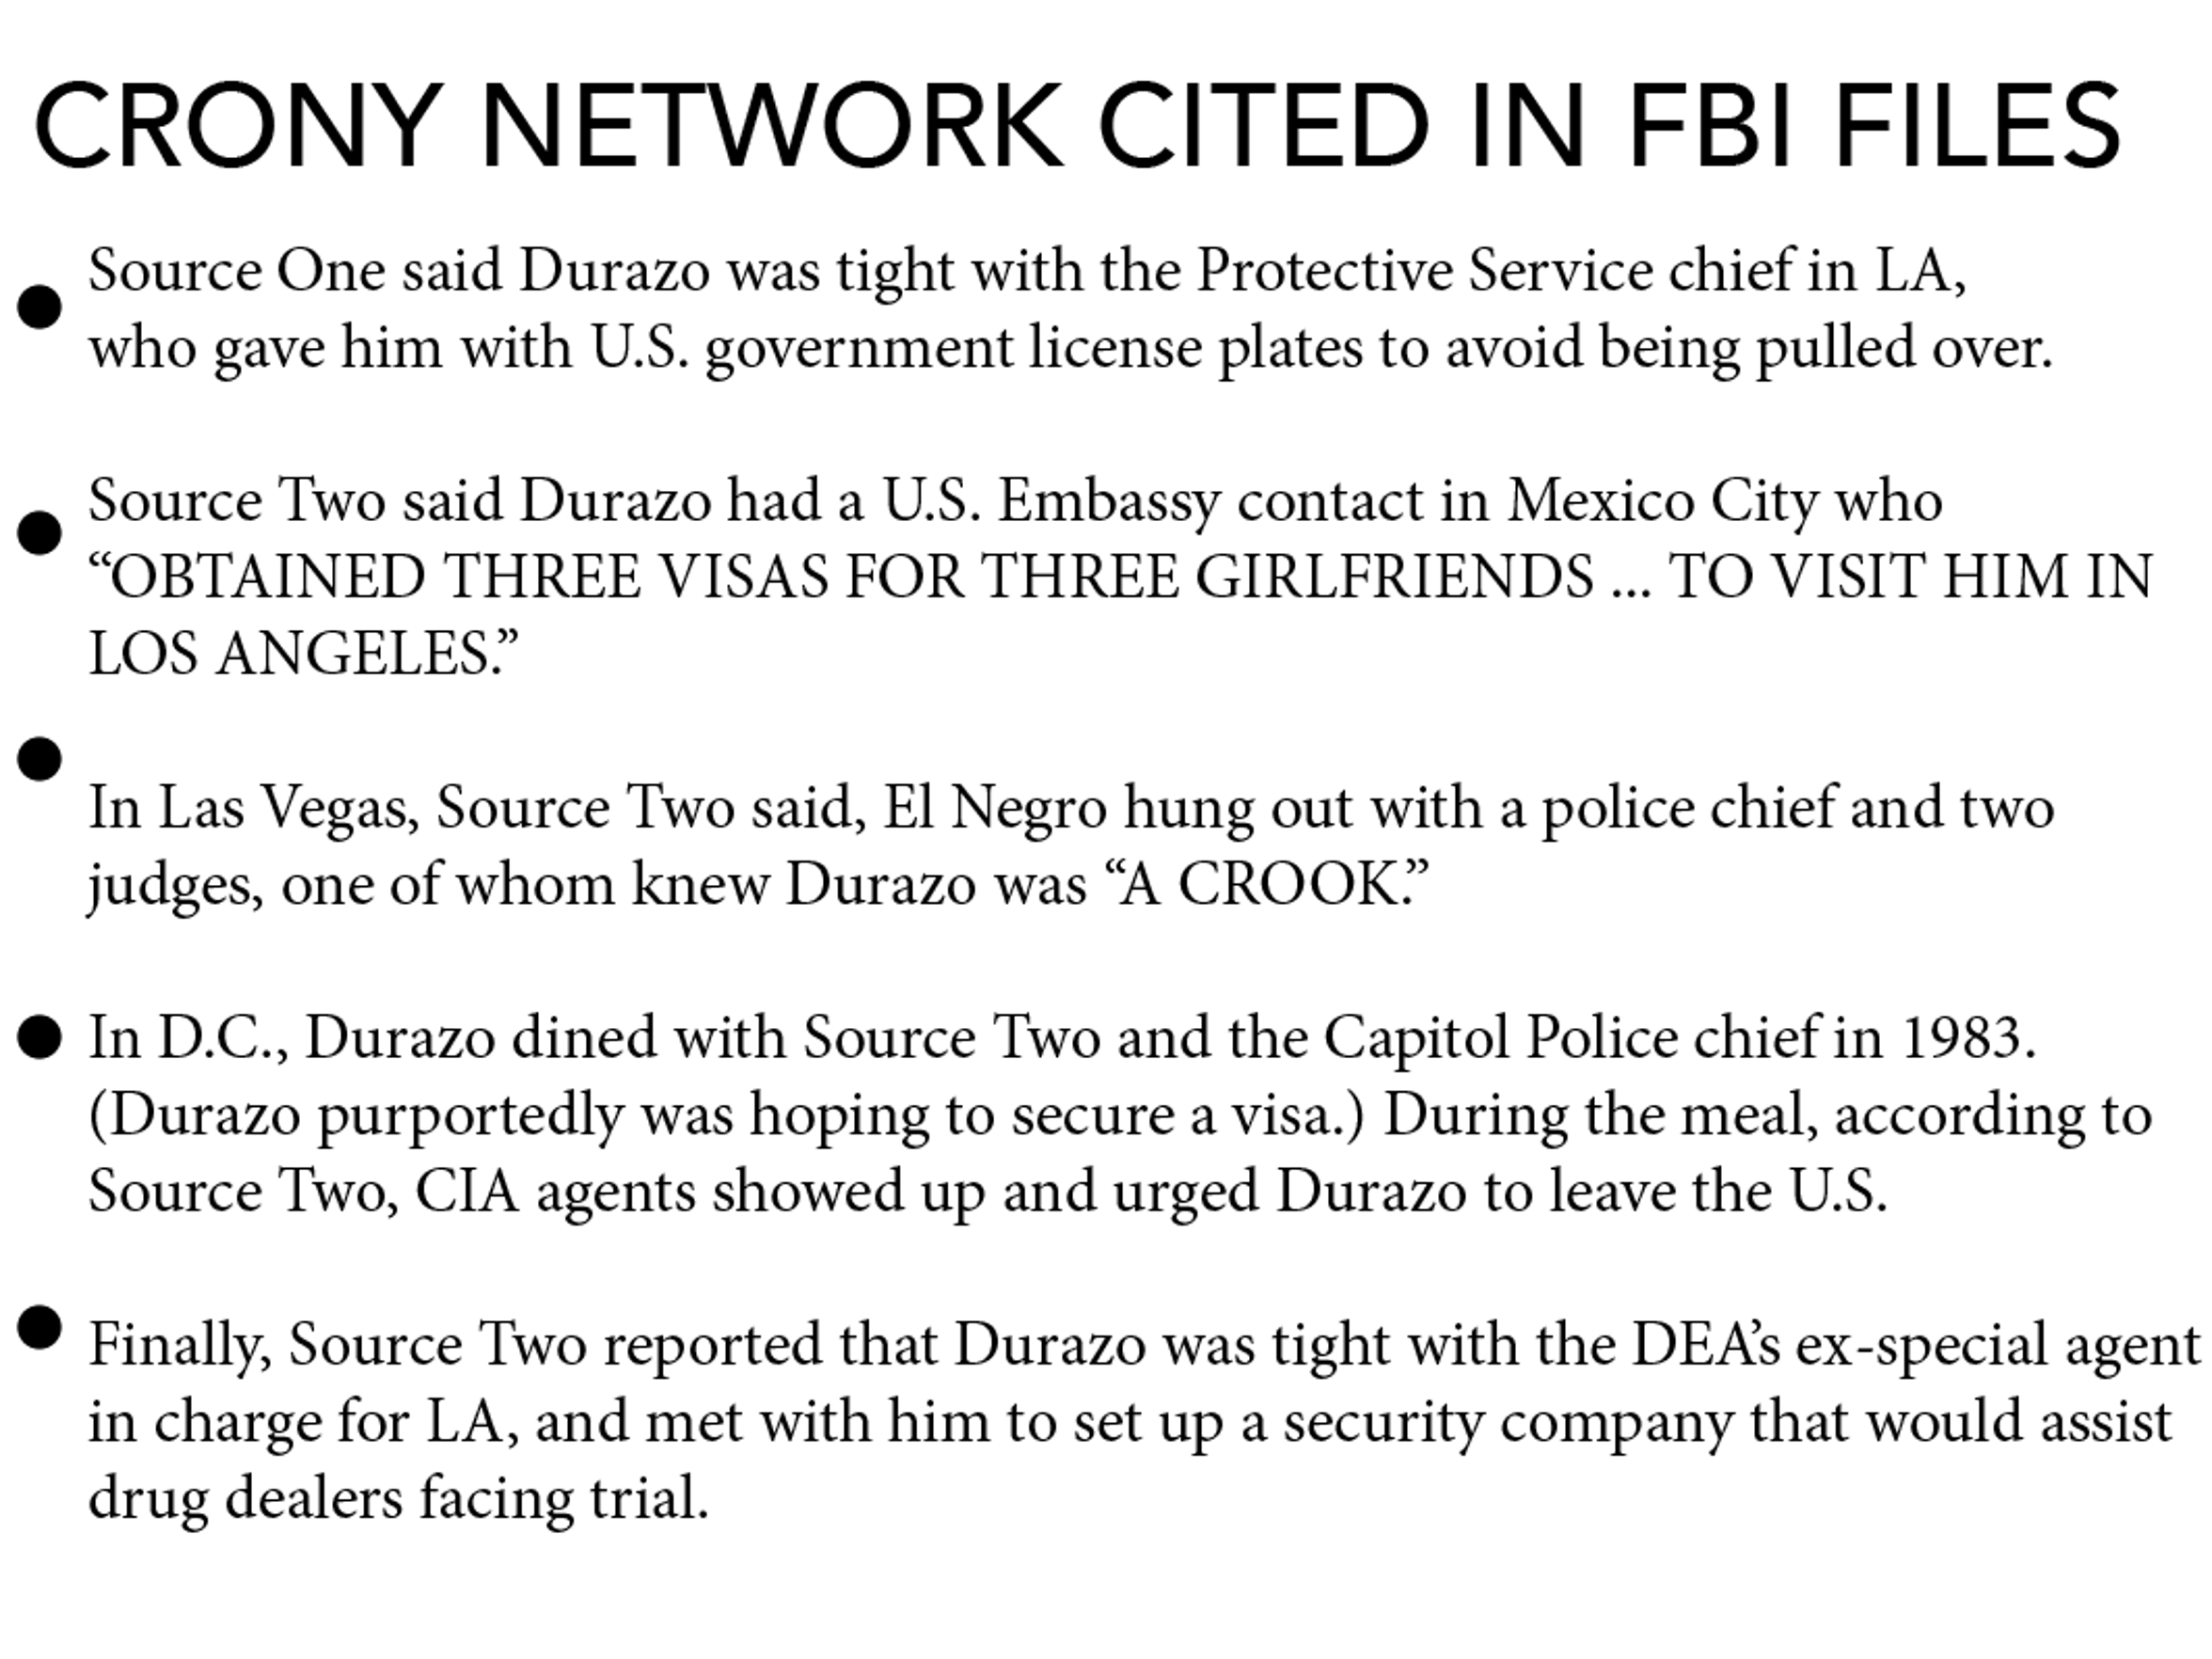 Arturo Durazo Moreno's tangled and crony network included